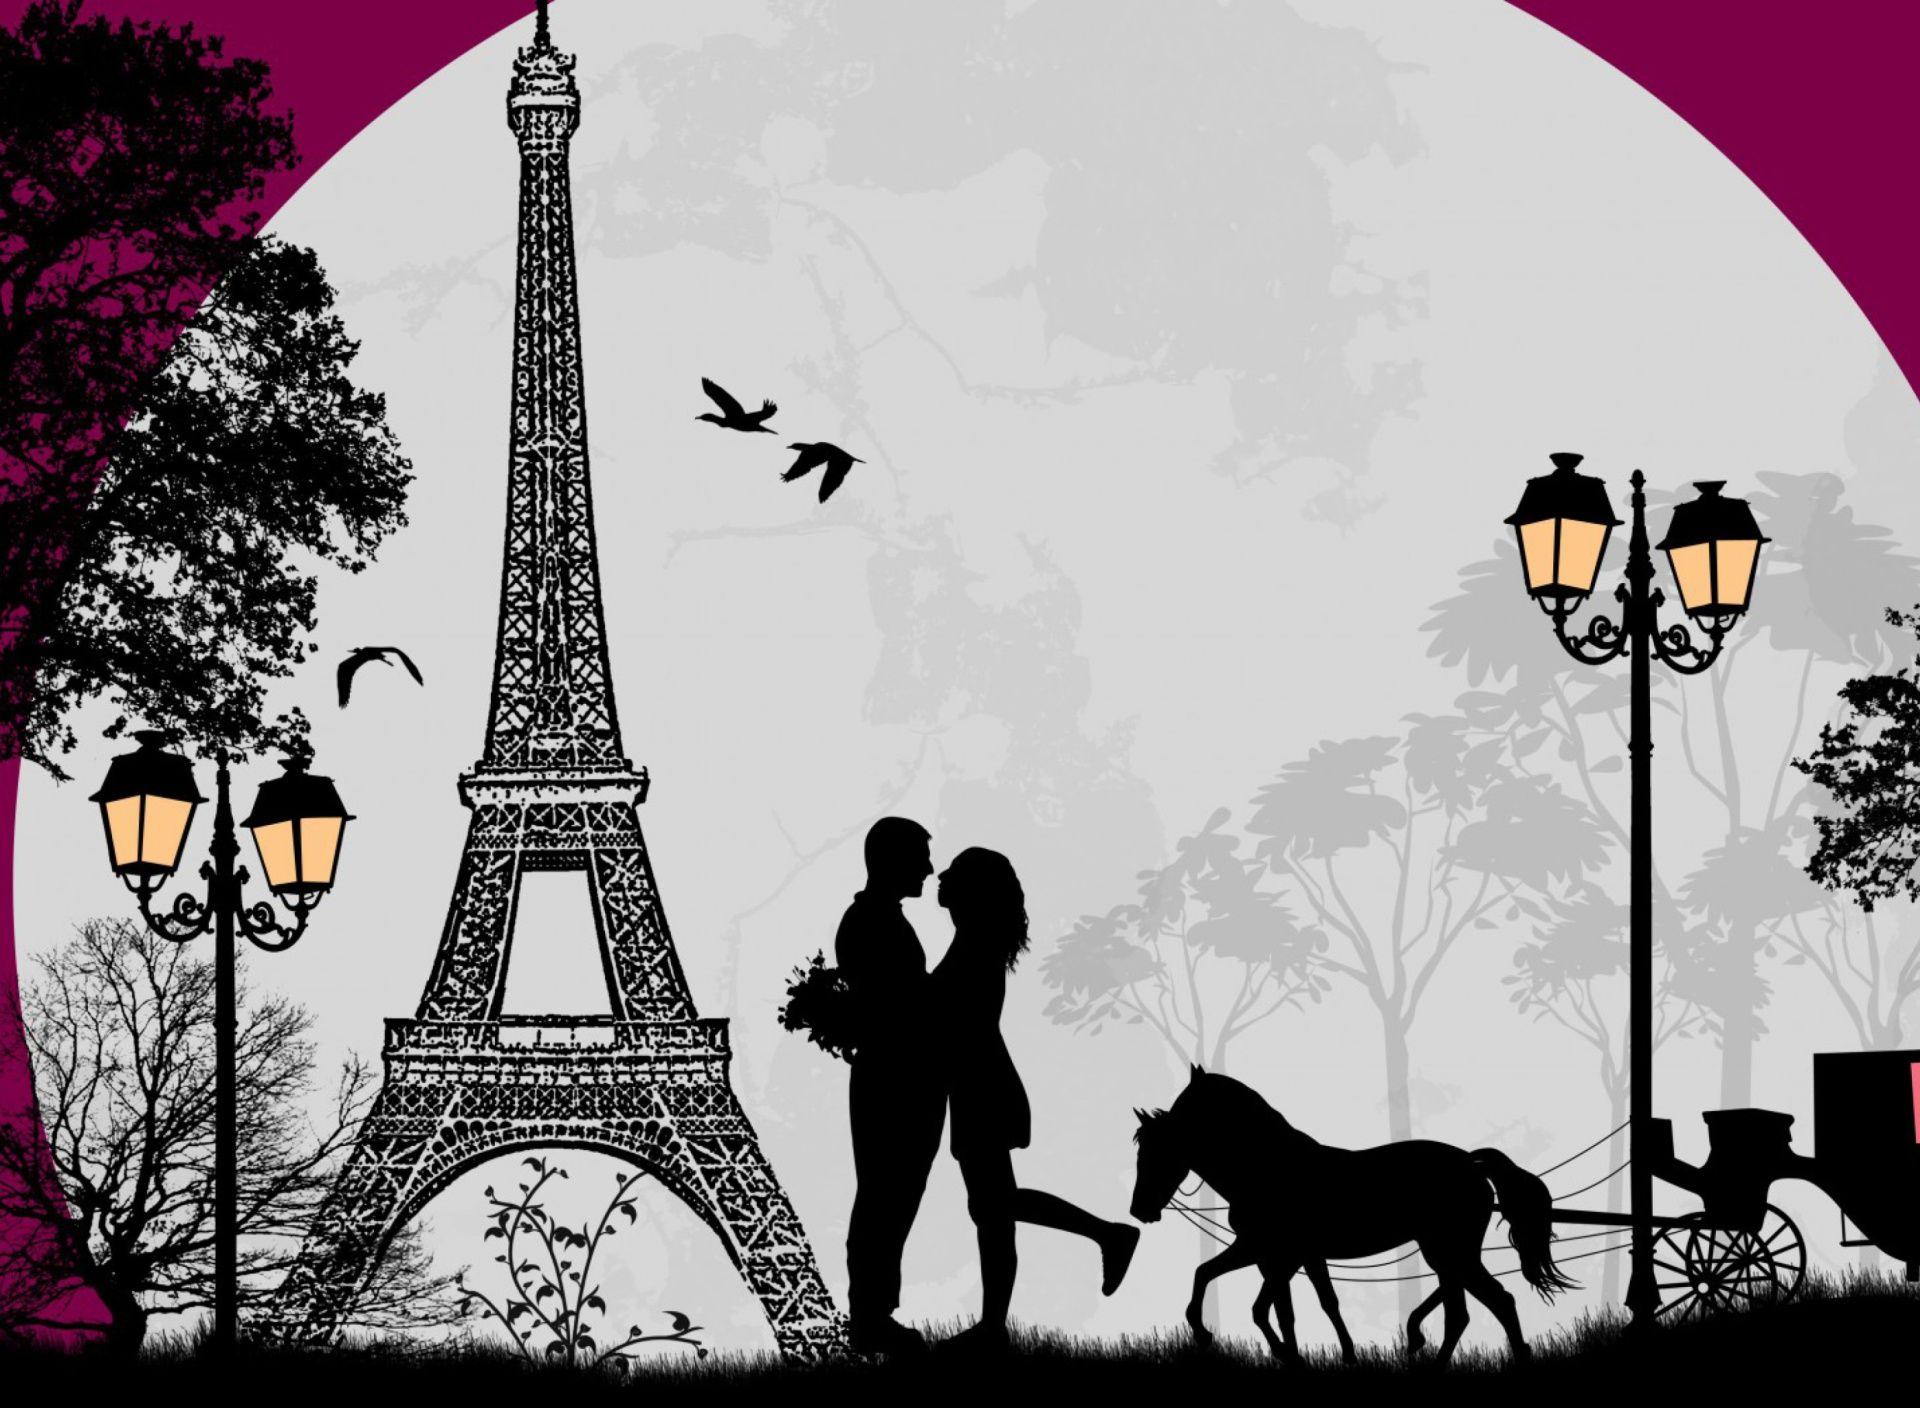 Wallpaper Paris Valentines Day In Wide Or Hd Digital Art Wallpapers Vrdwfn